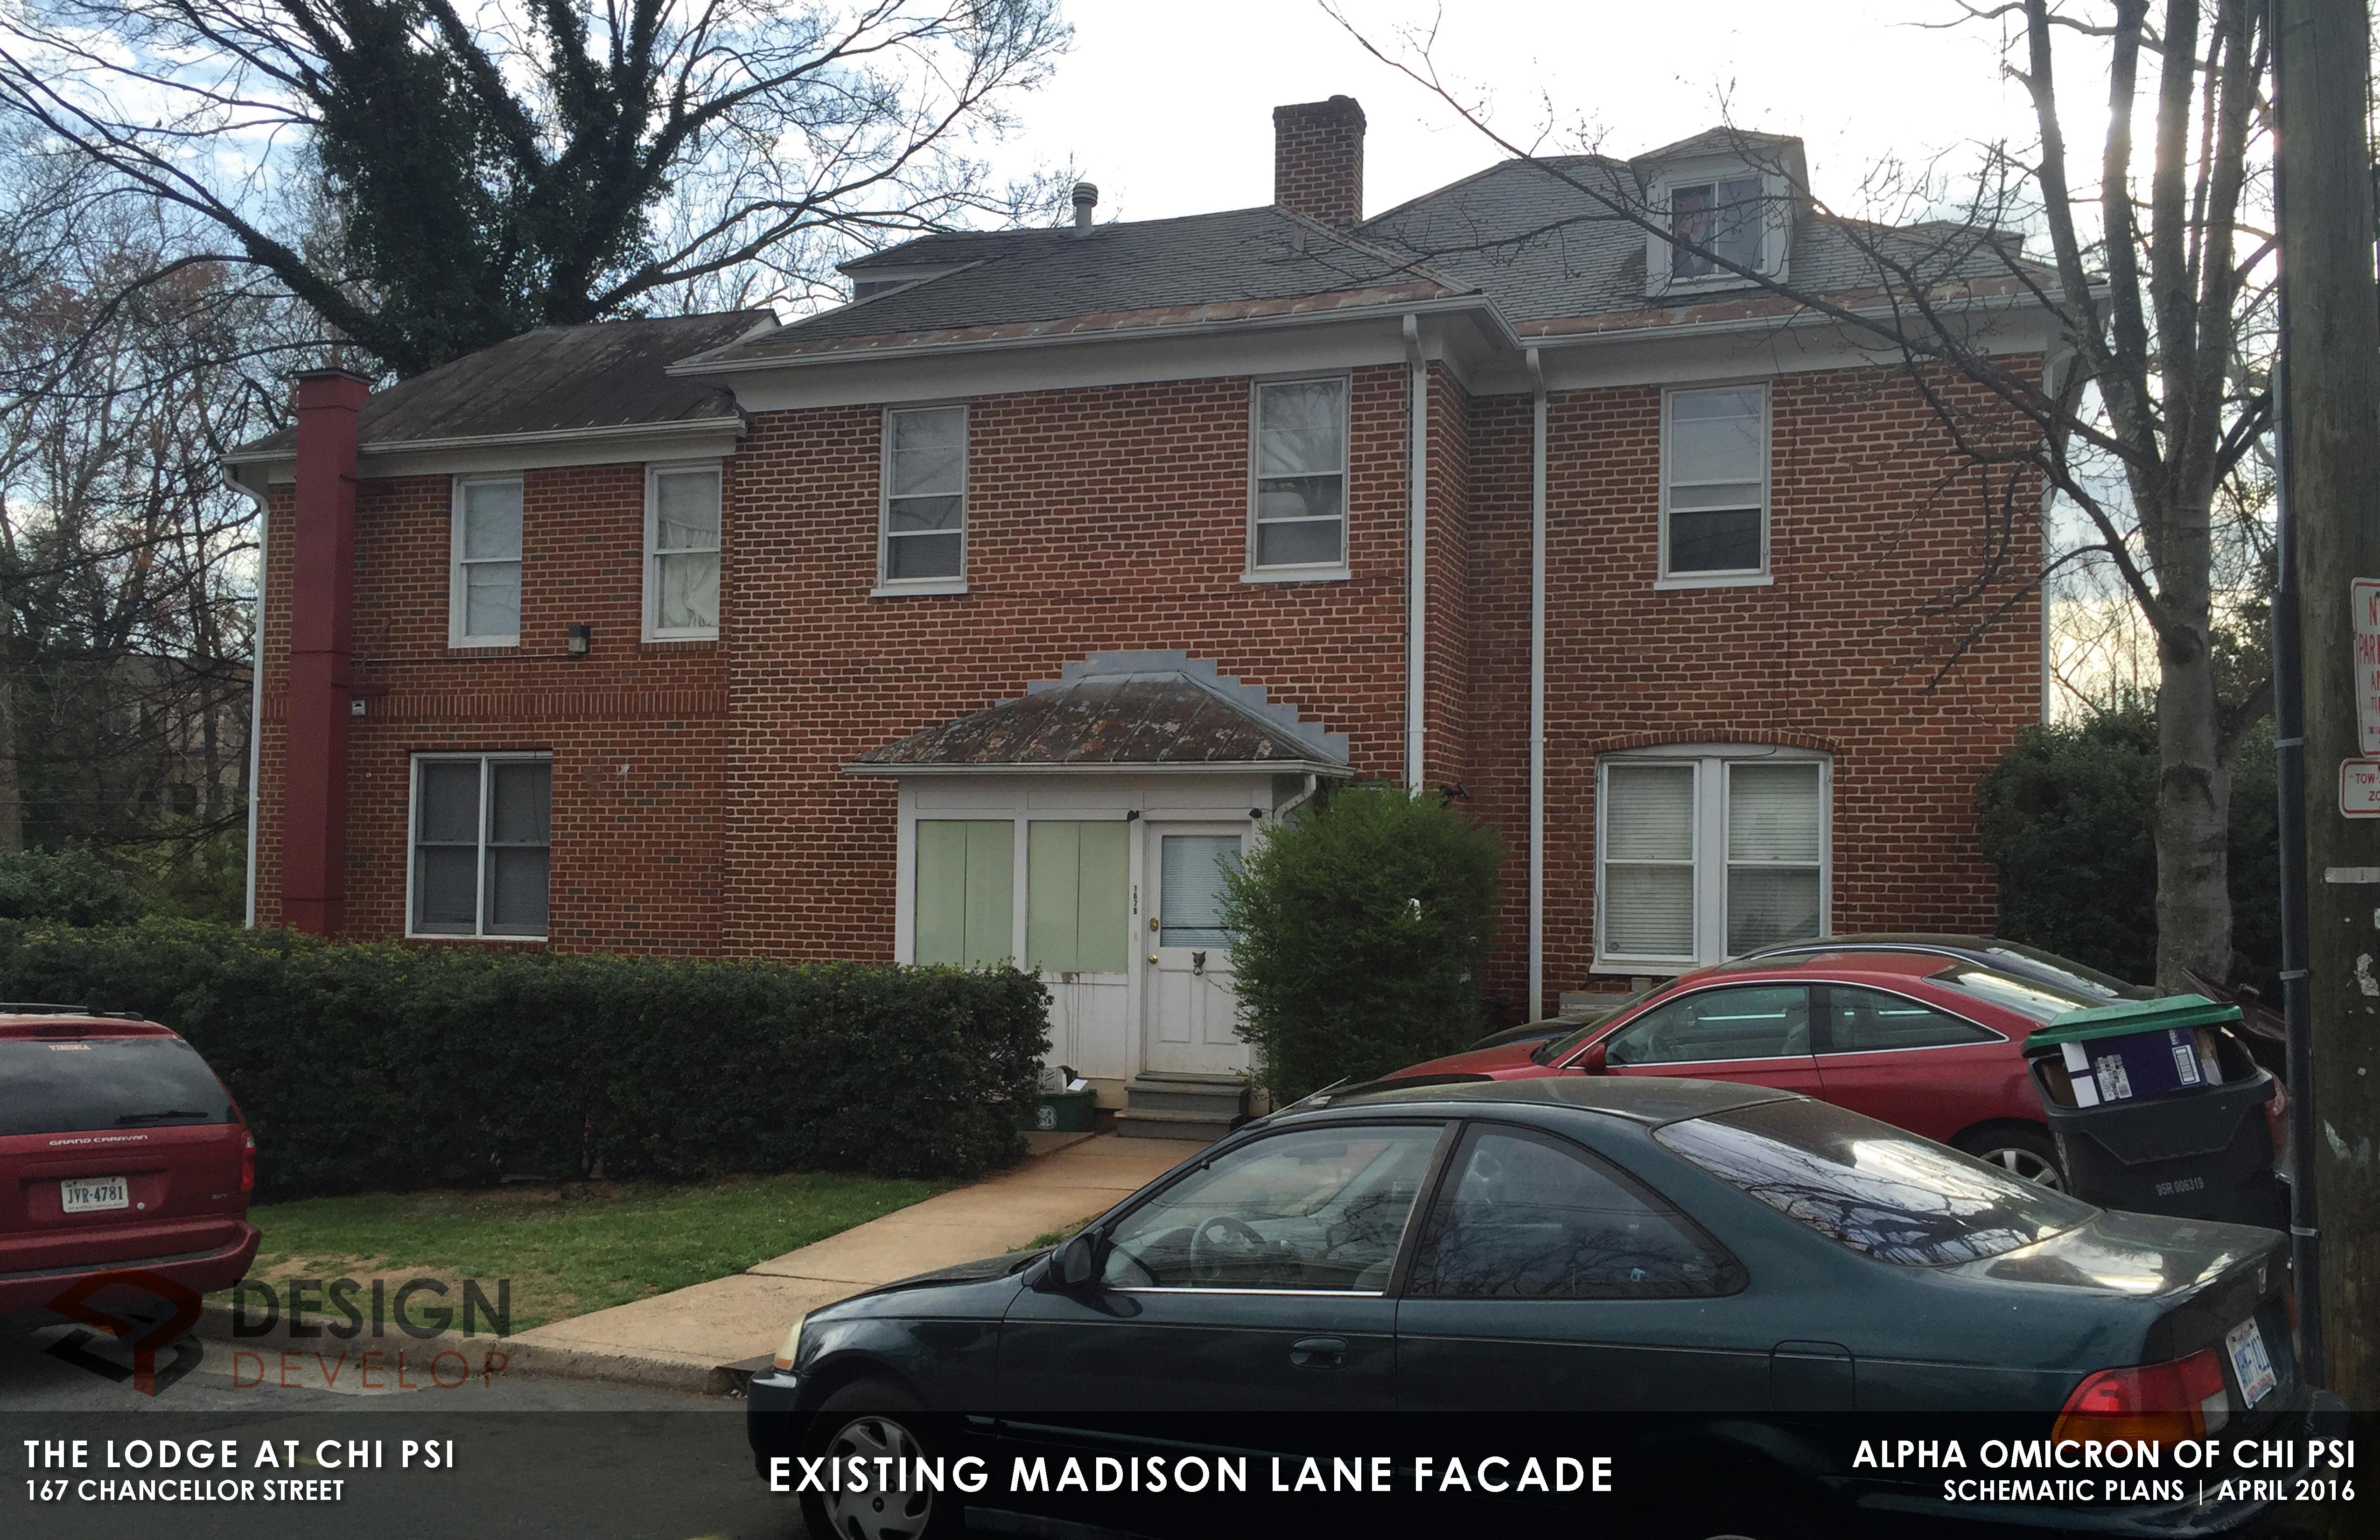 Existing Madison Lane Facade